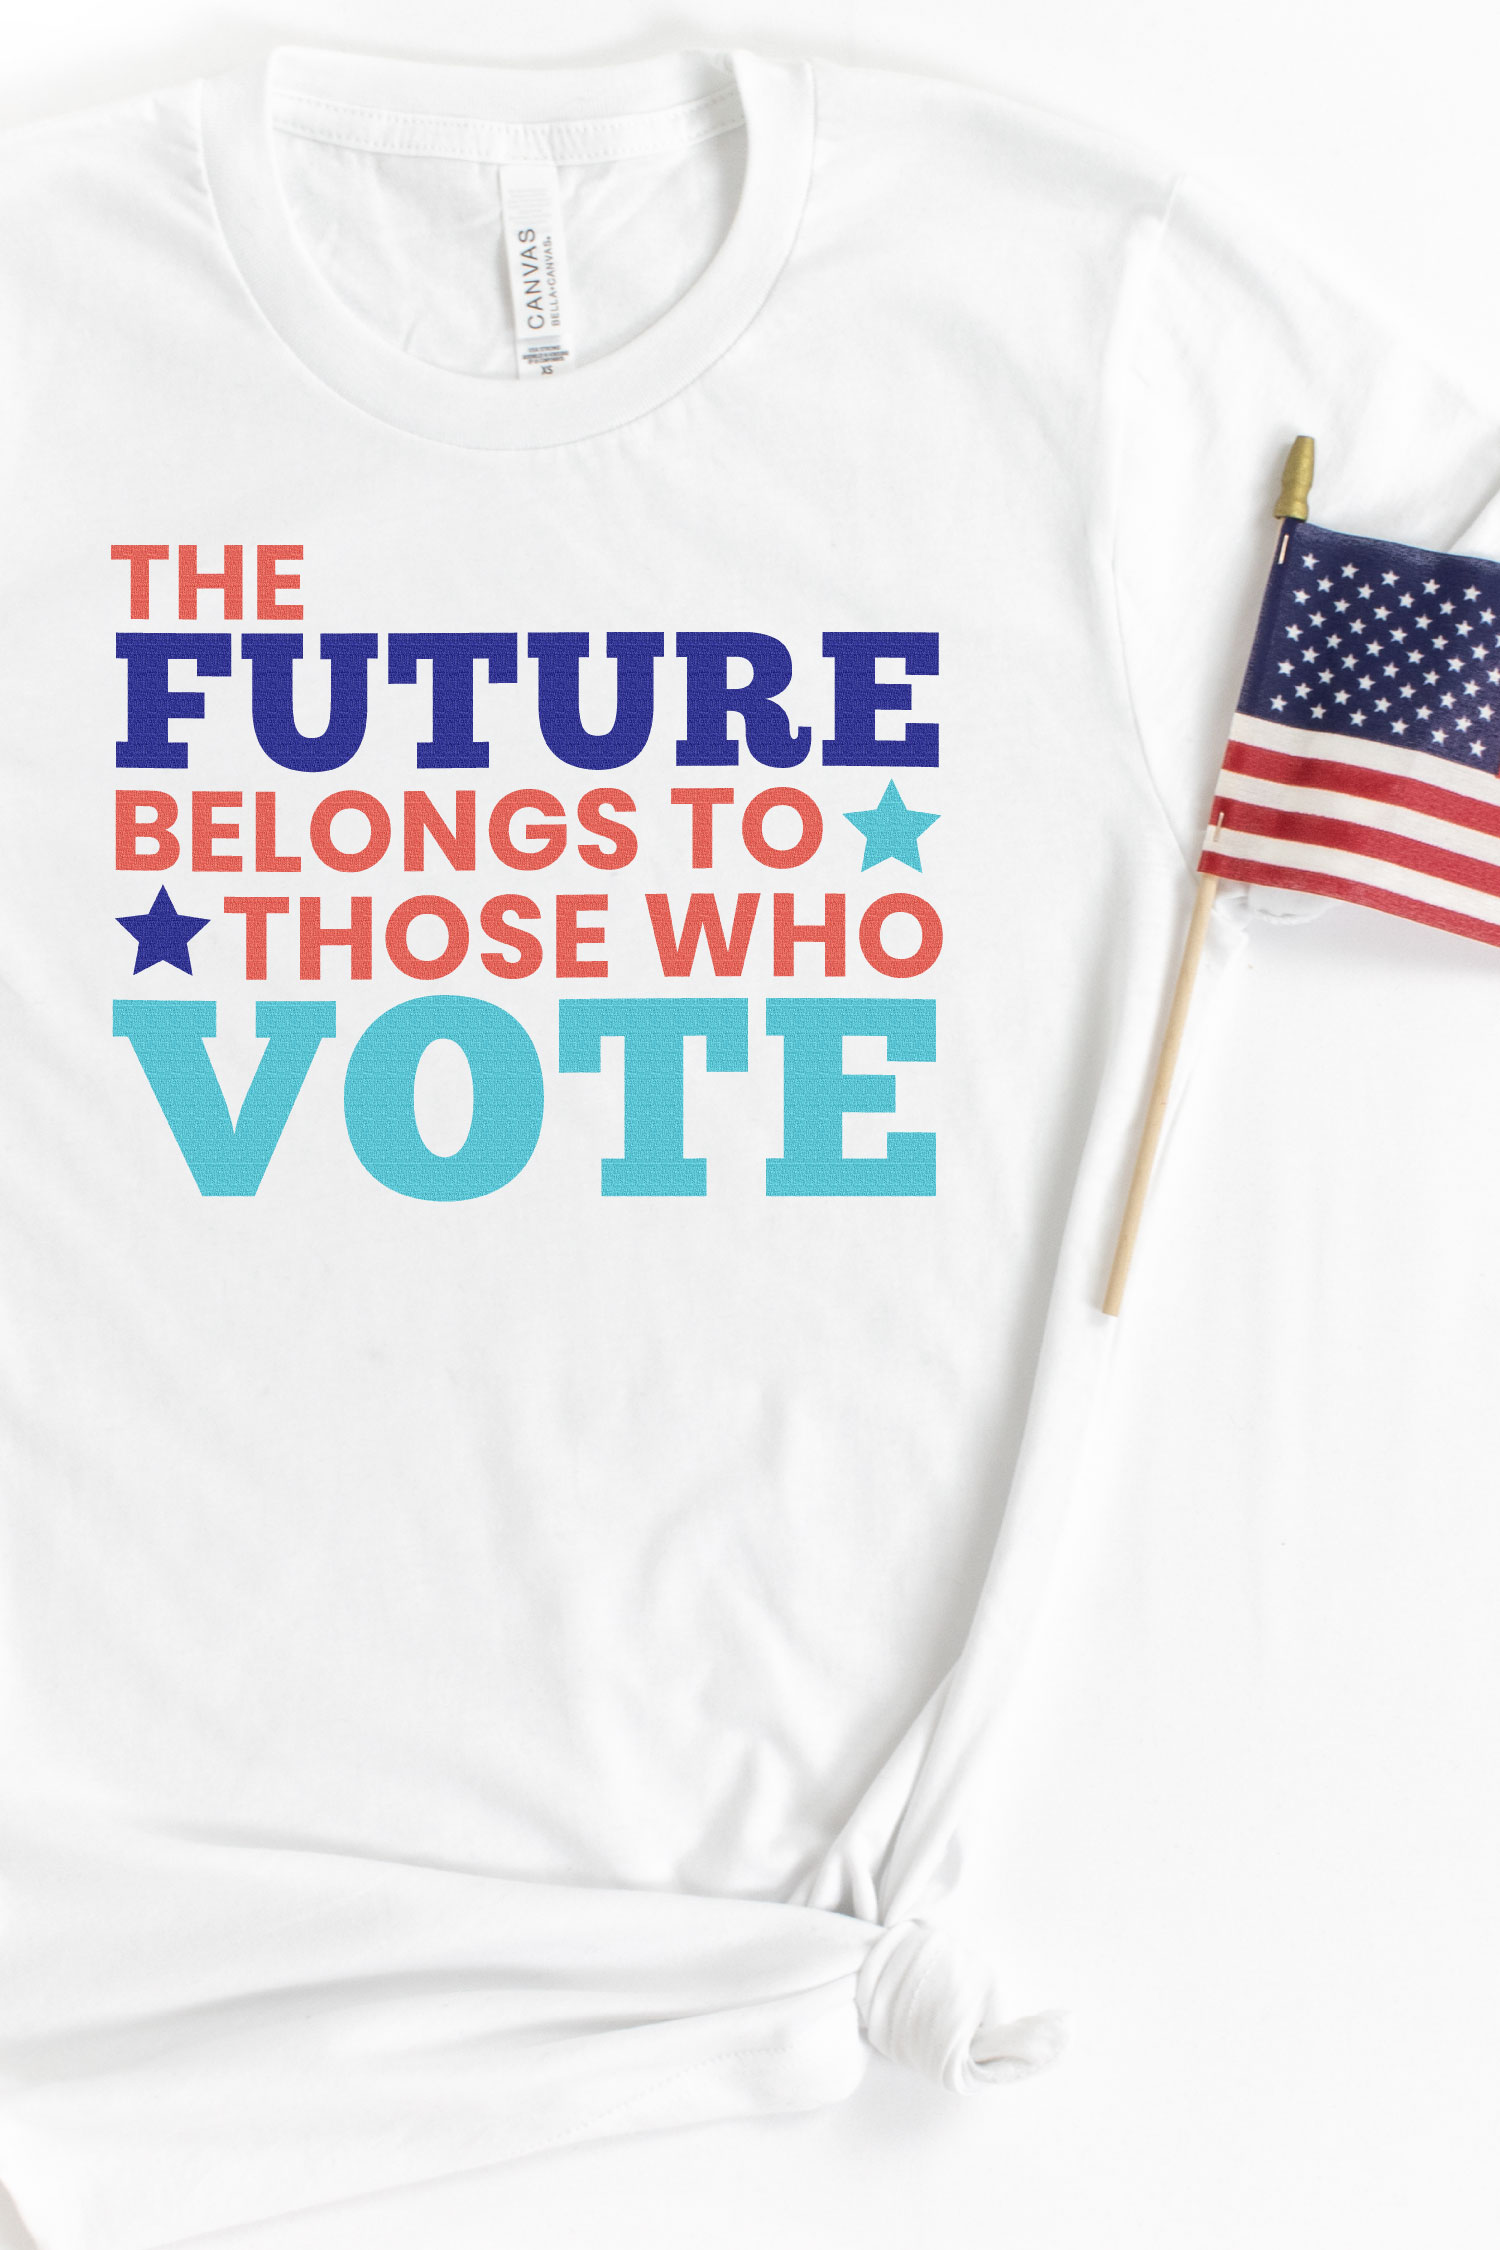 voting SVG on shirt